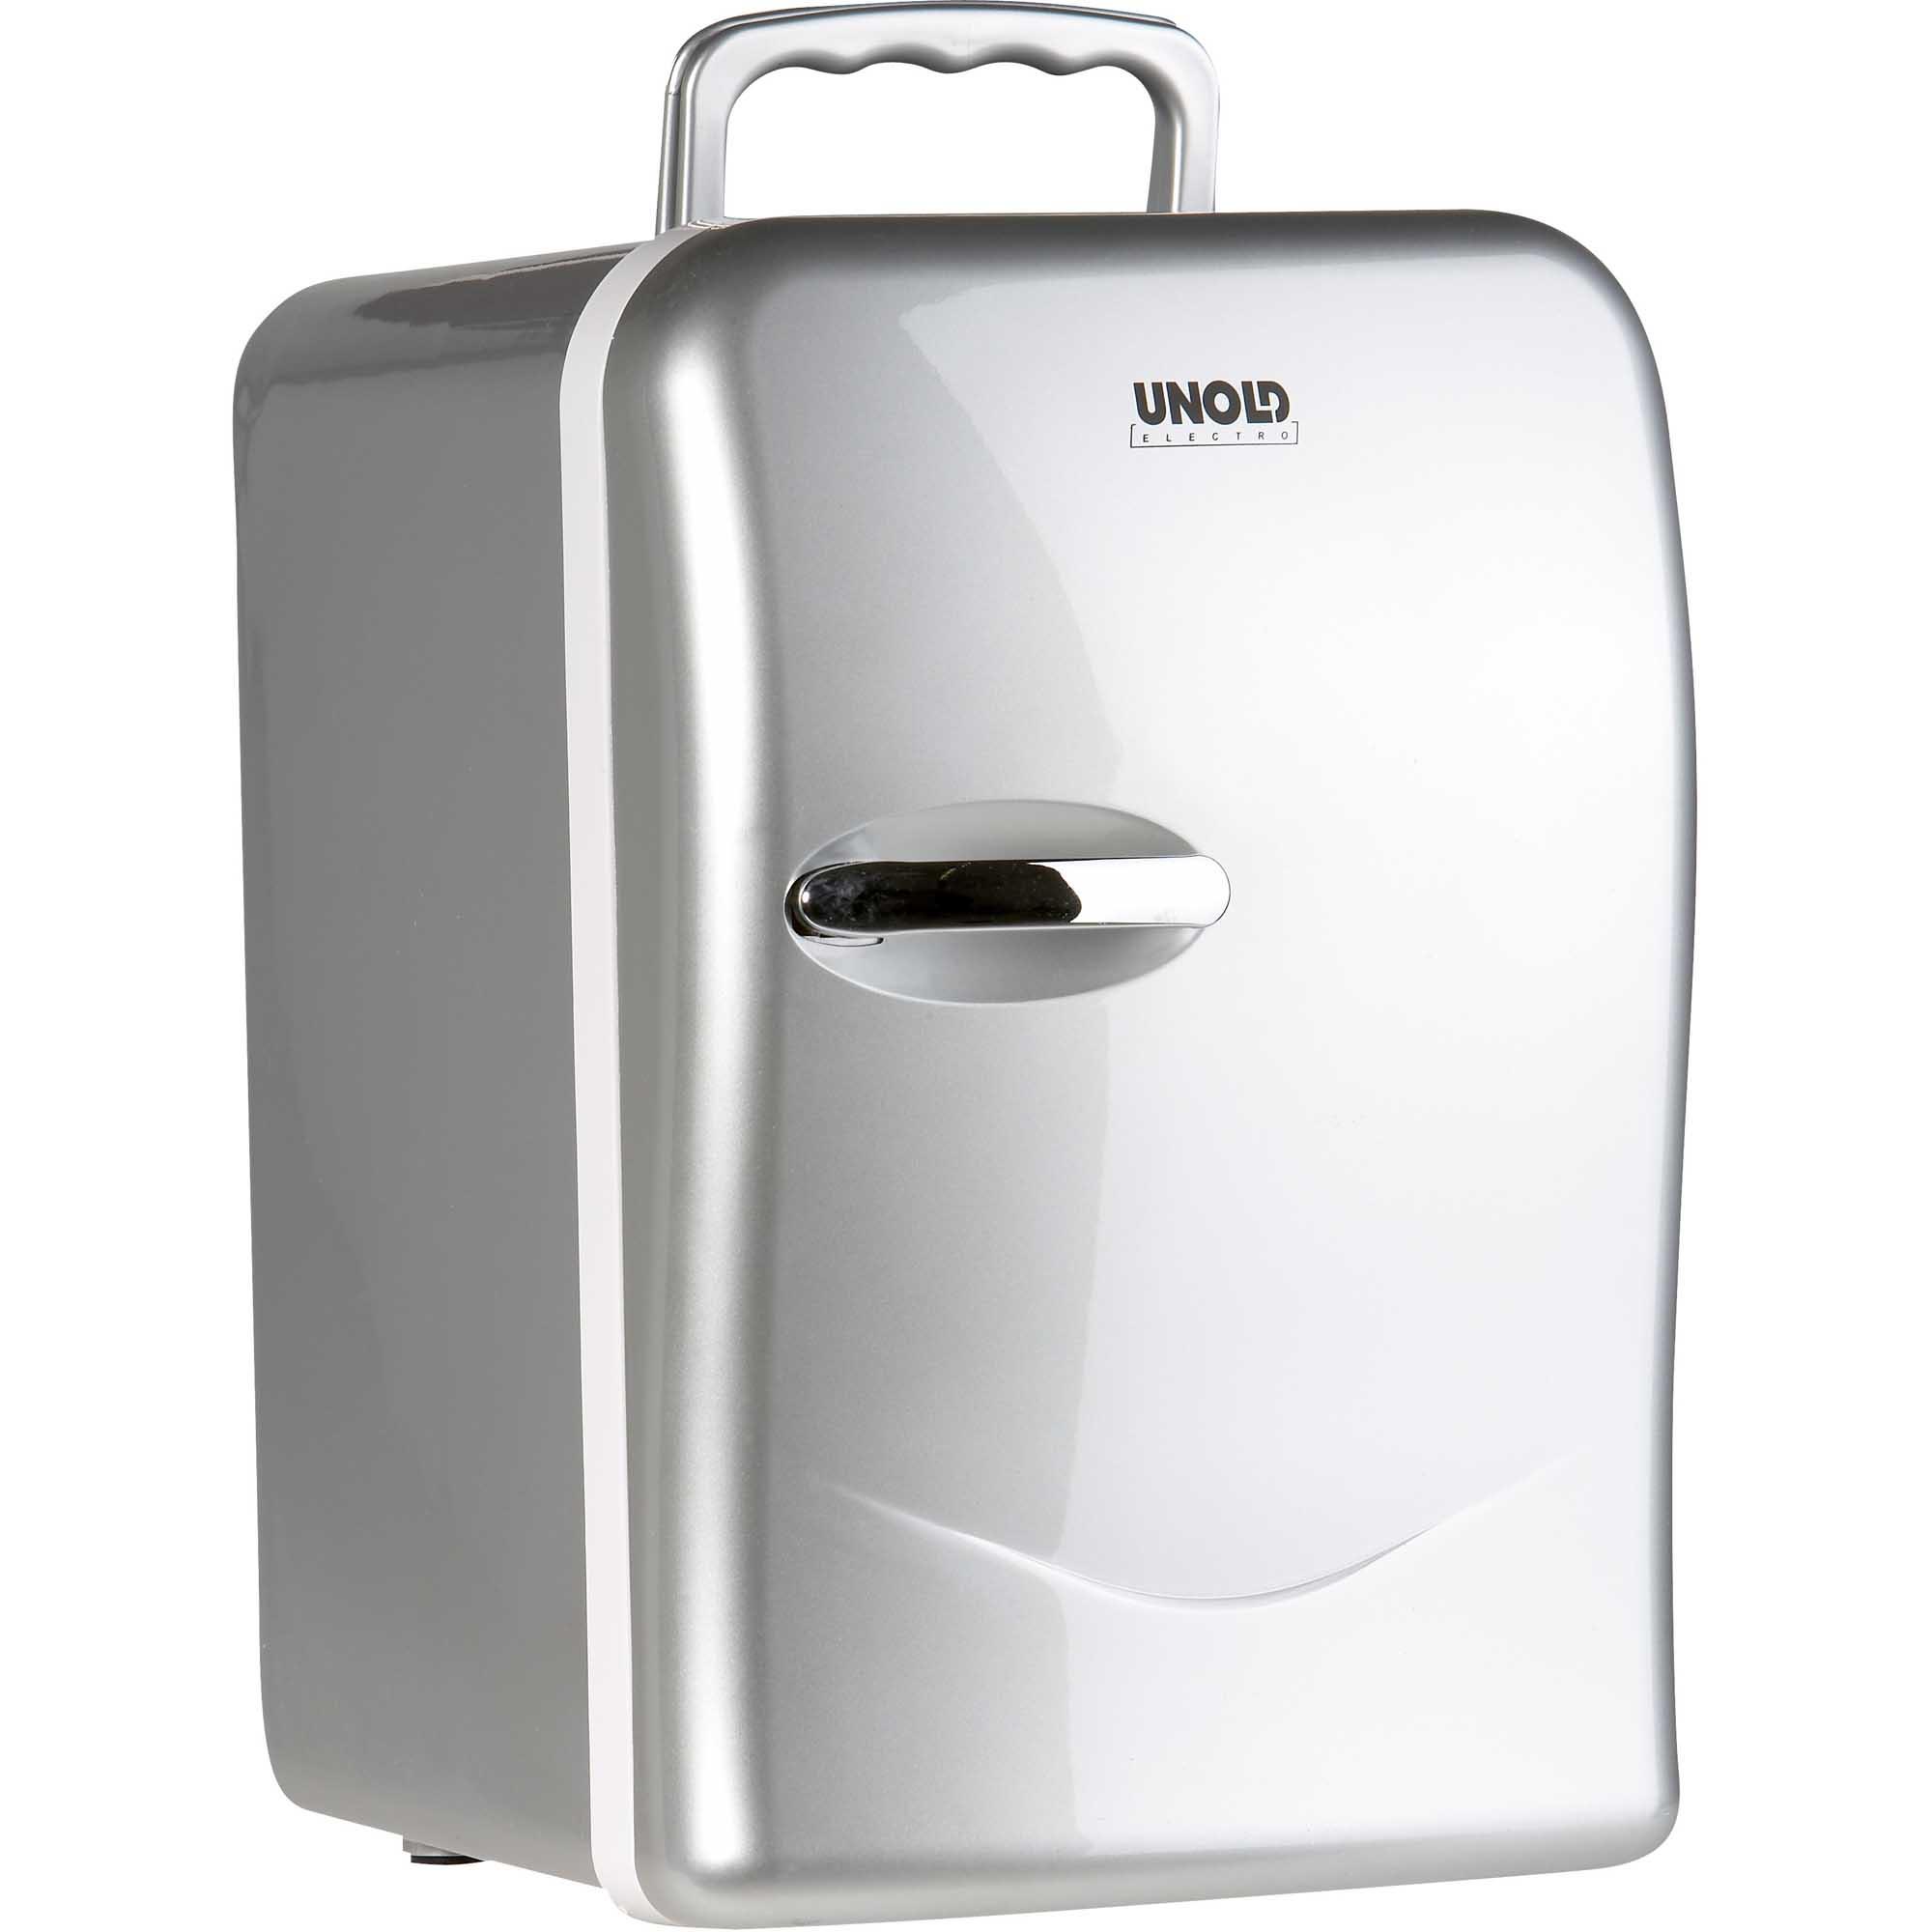 Unold Maxi-Cooler